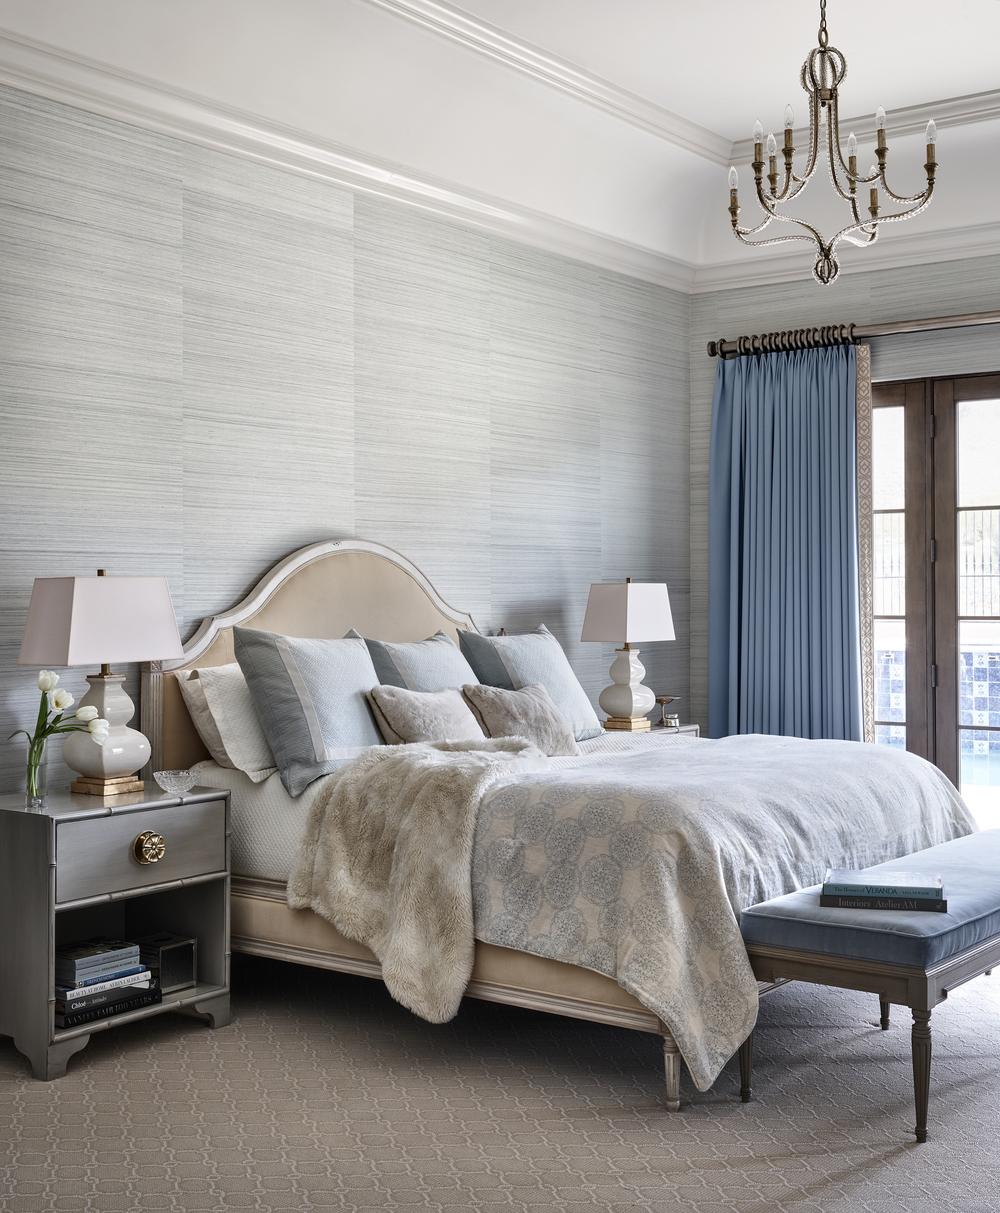 PHX_KimScodro_Buell_Residence_Master_Bedroom_0211.jpg